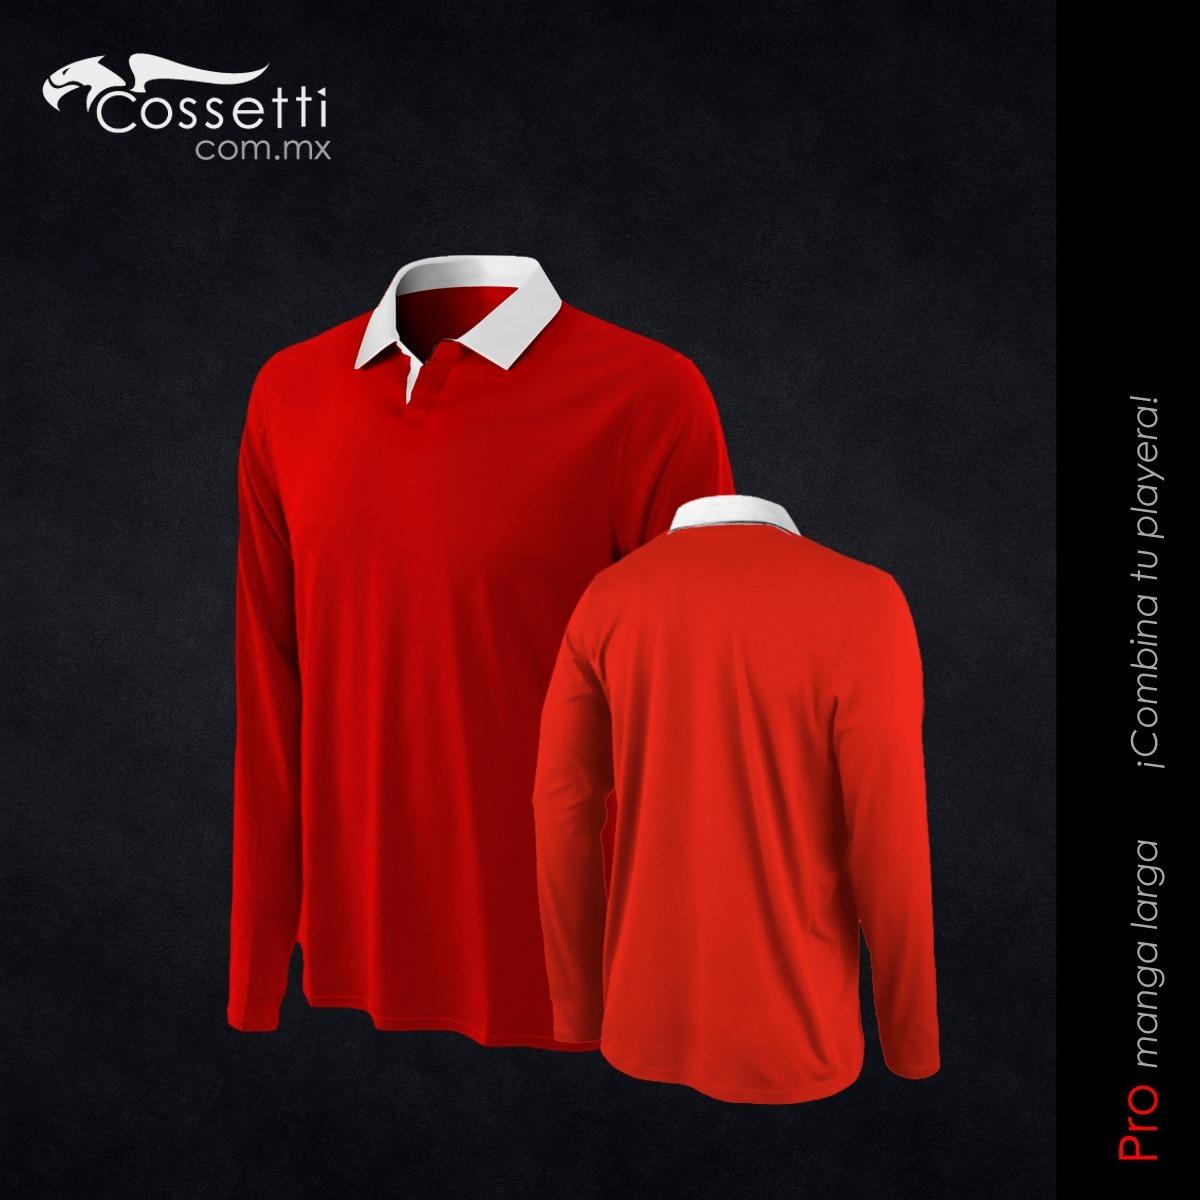 Playera Tipo Polo Manga Larga Dry Fit Hombre Cossetti -   280.00 en ... 61fb7c7f31dee